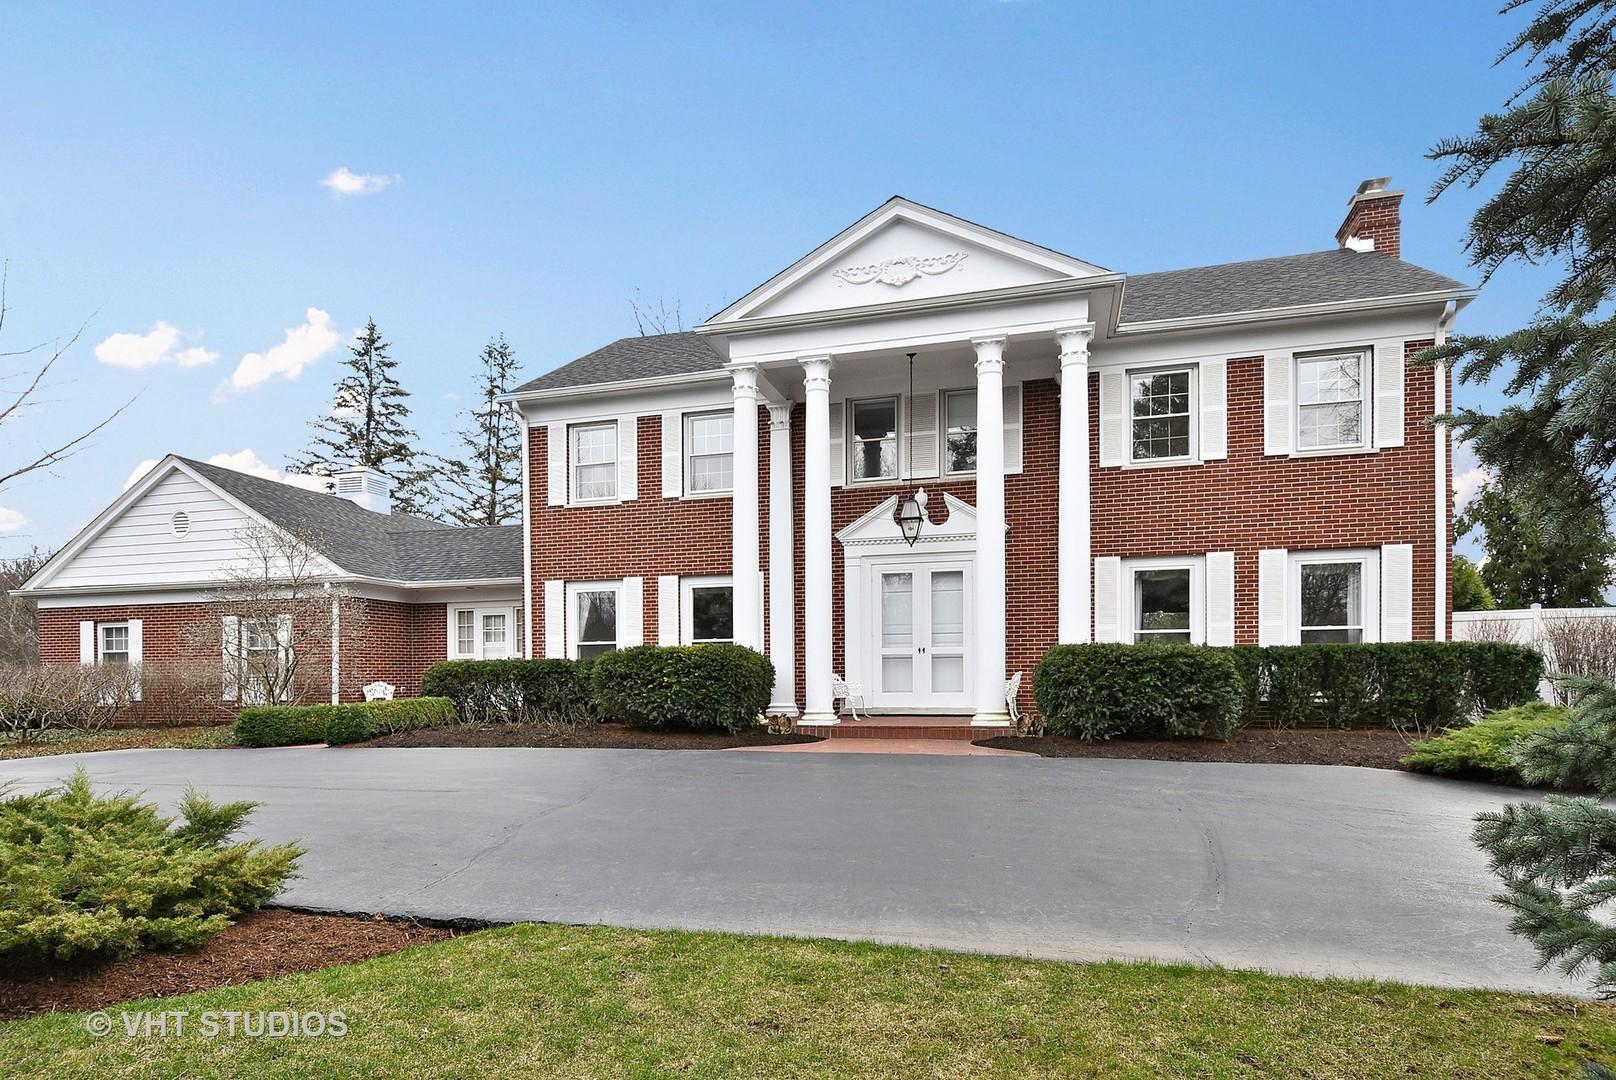 Property Photo For 429 Caesar Drive, BARRINGTON HILLS, IL 60010, MLS #  09906315